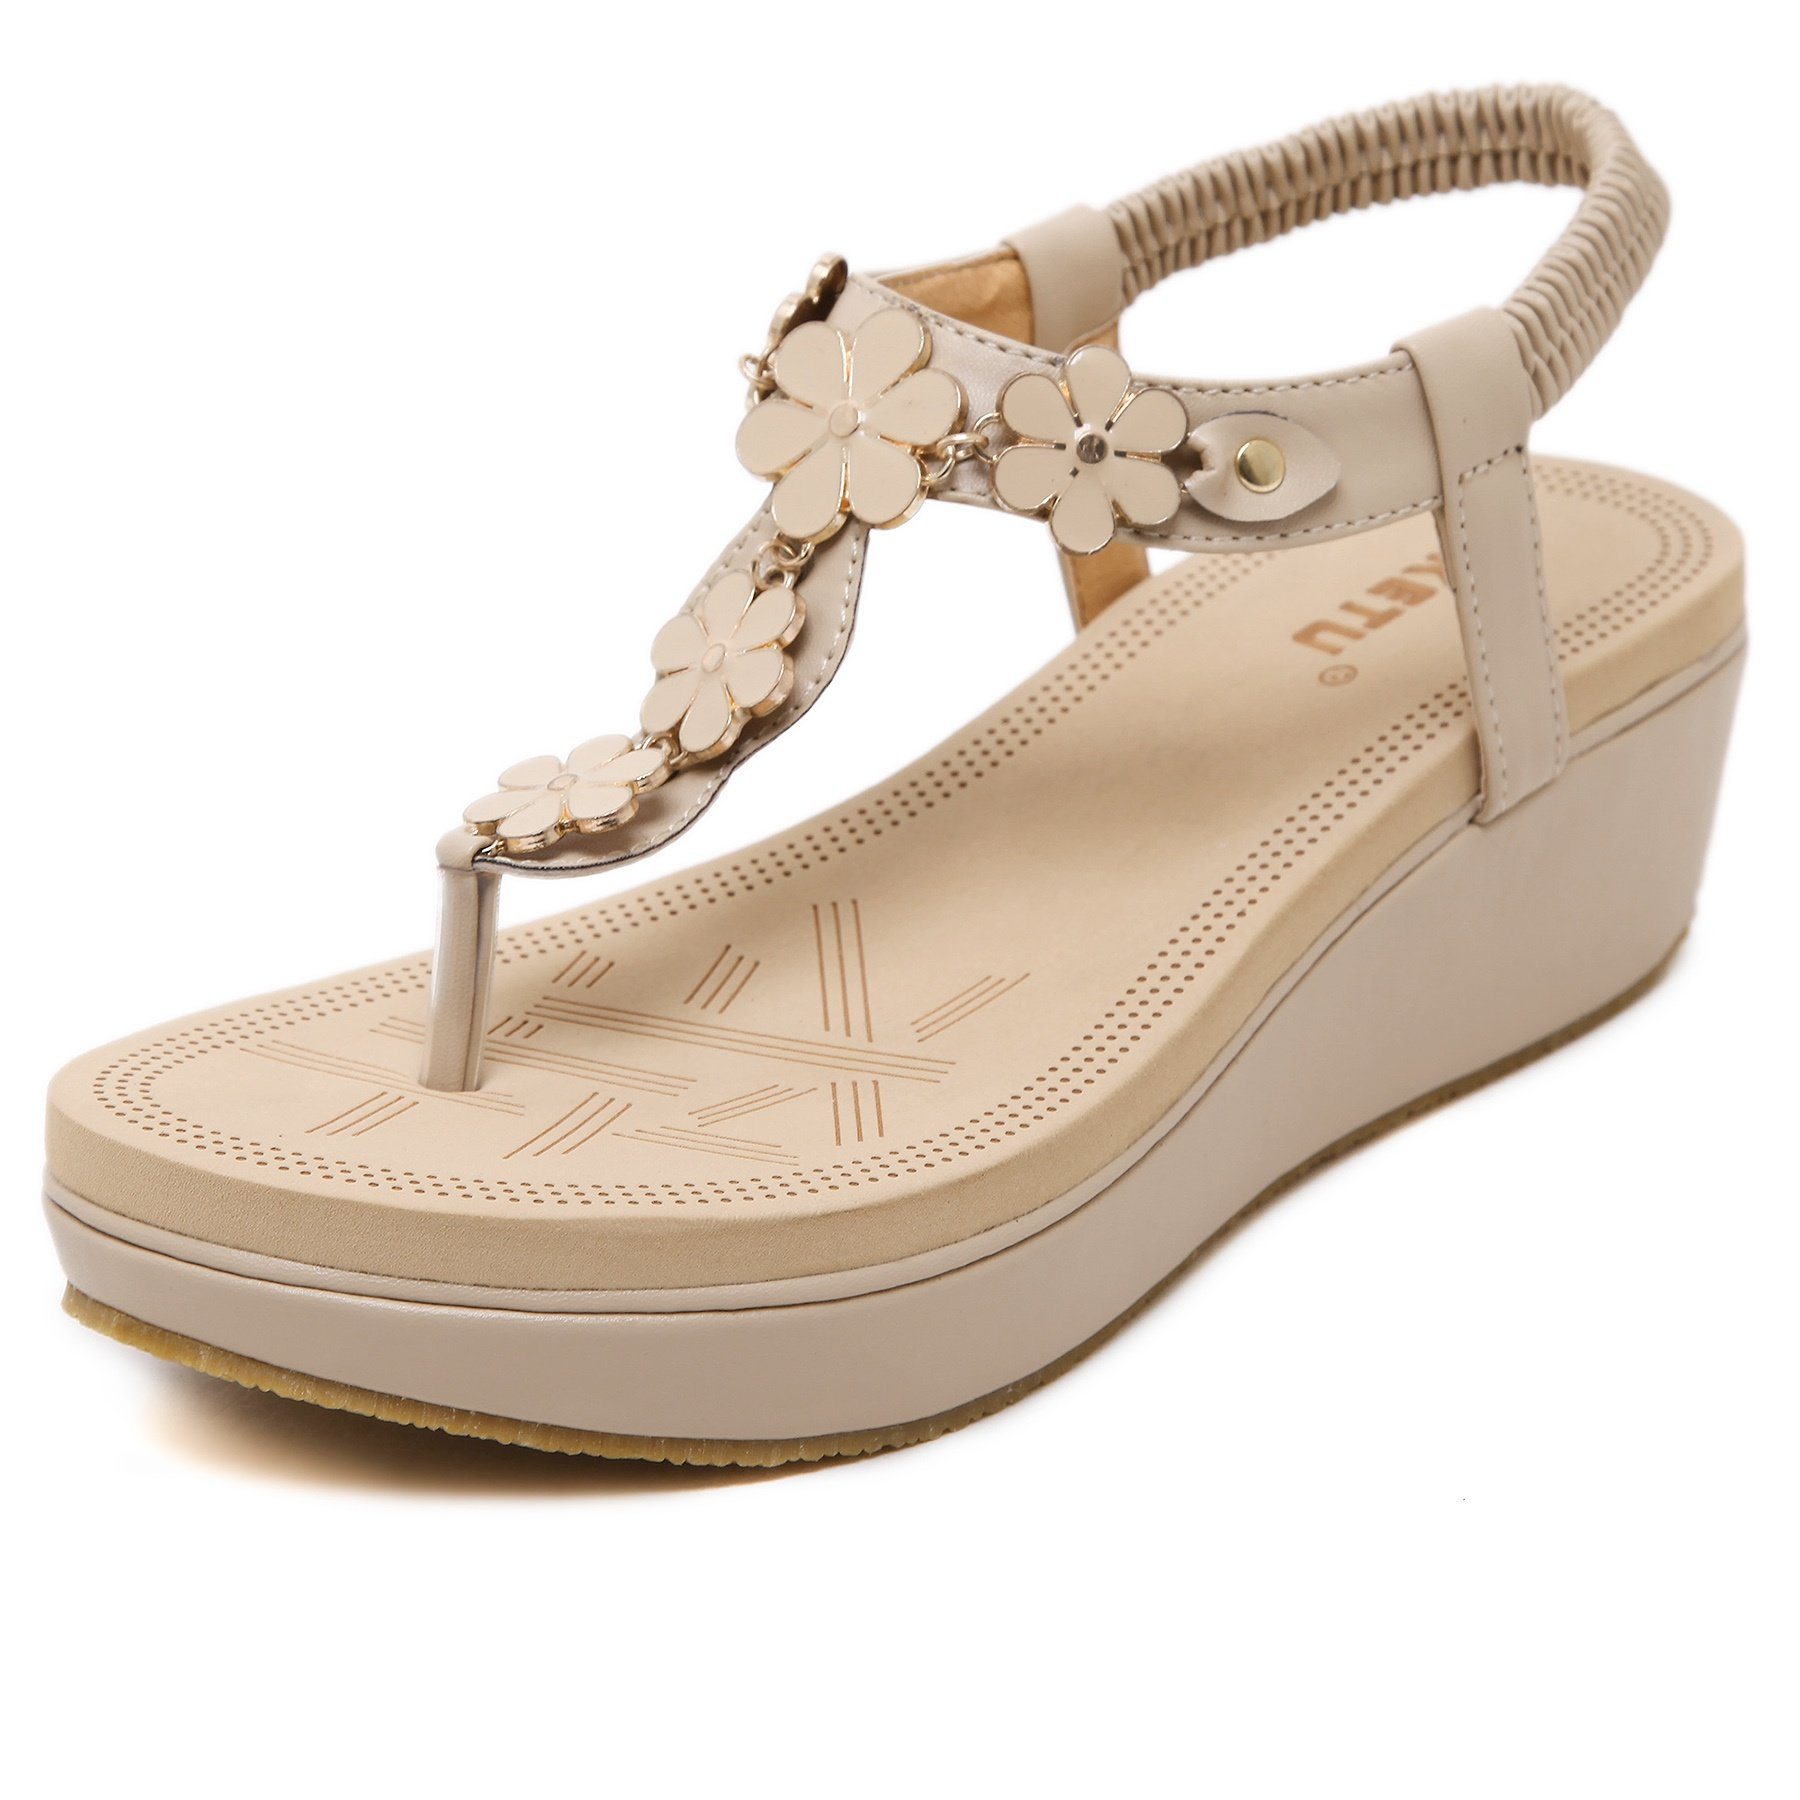 Meeshine Womens Wedge Sandals Thong Platform Beaded Slingback Bohemia Summer Sandal New Apricot 6 US